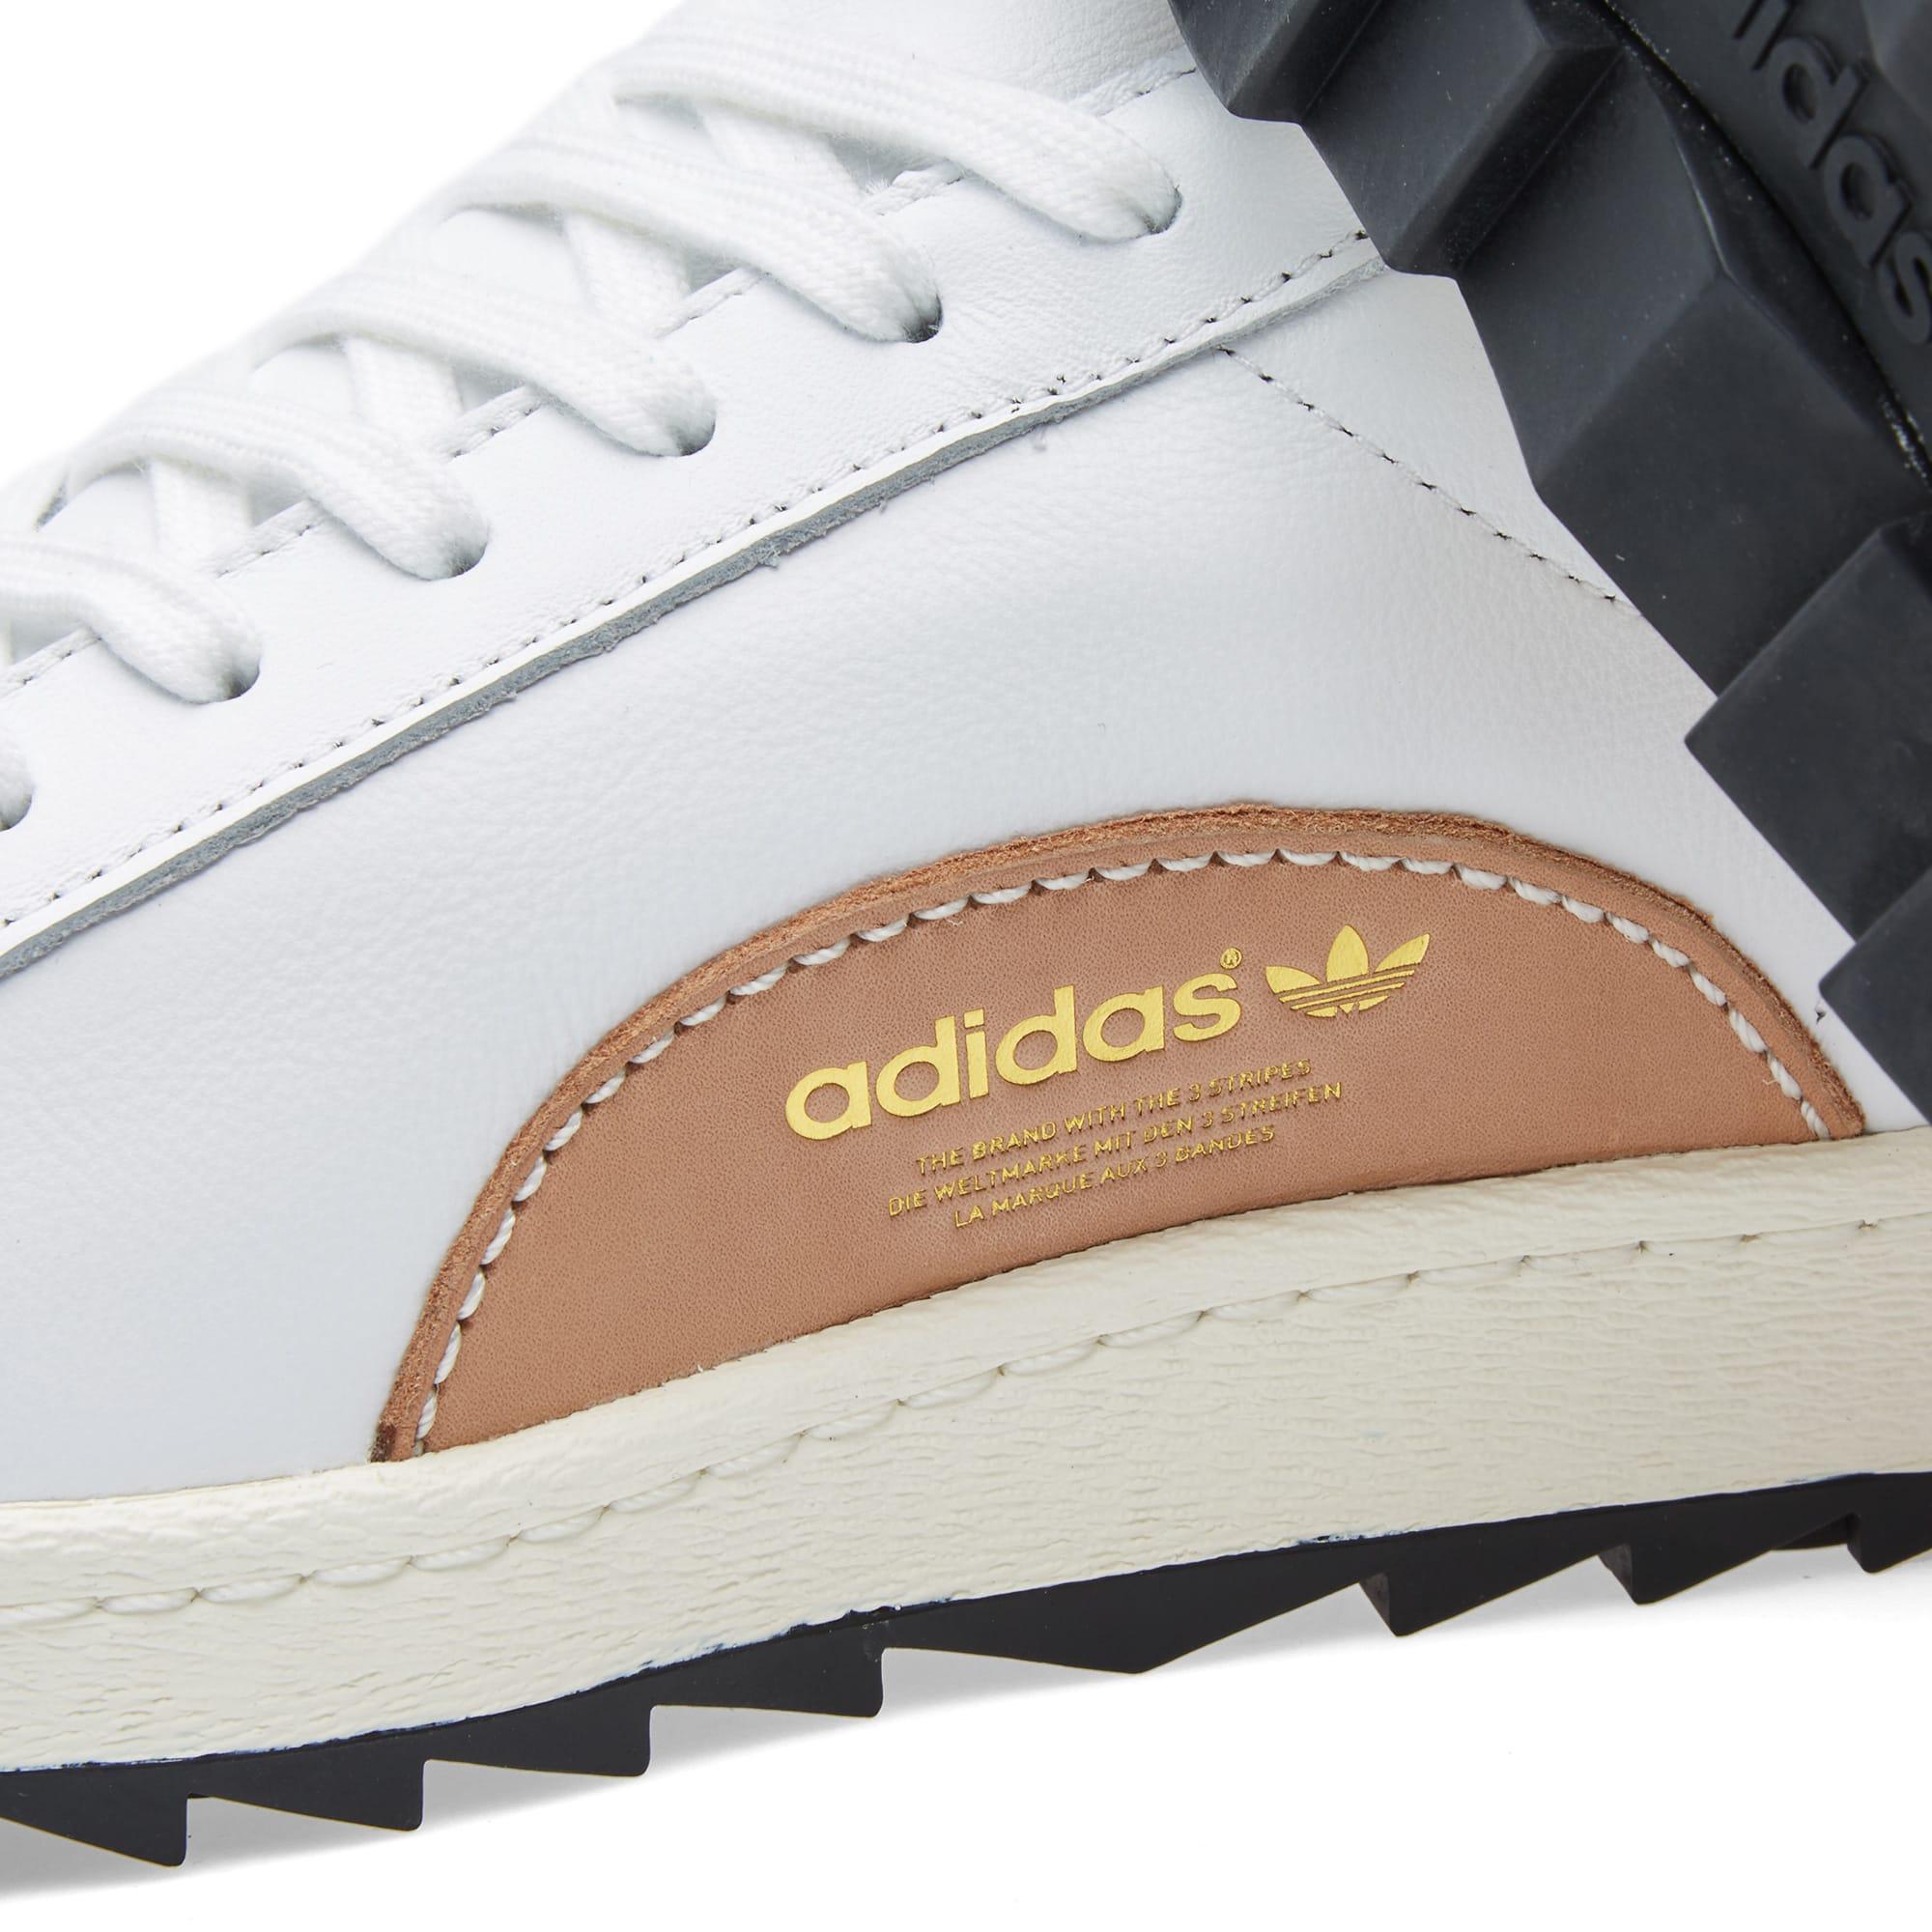 Adidas Superstar 80s Remastered White